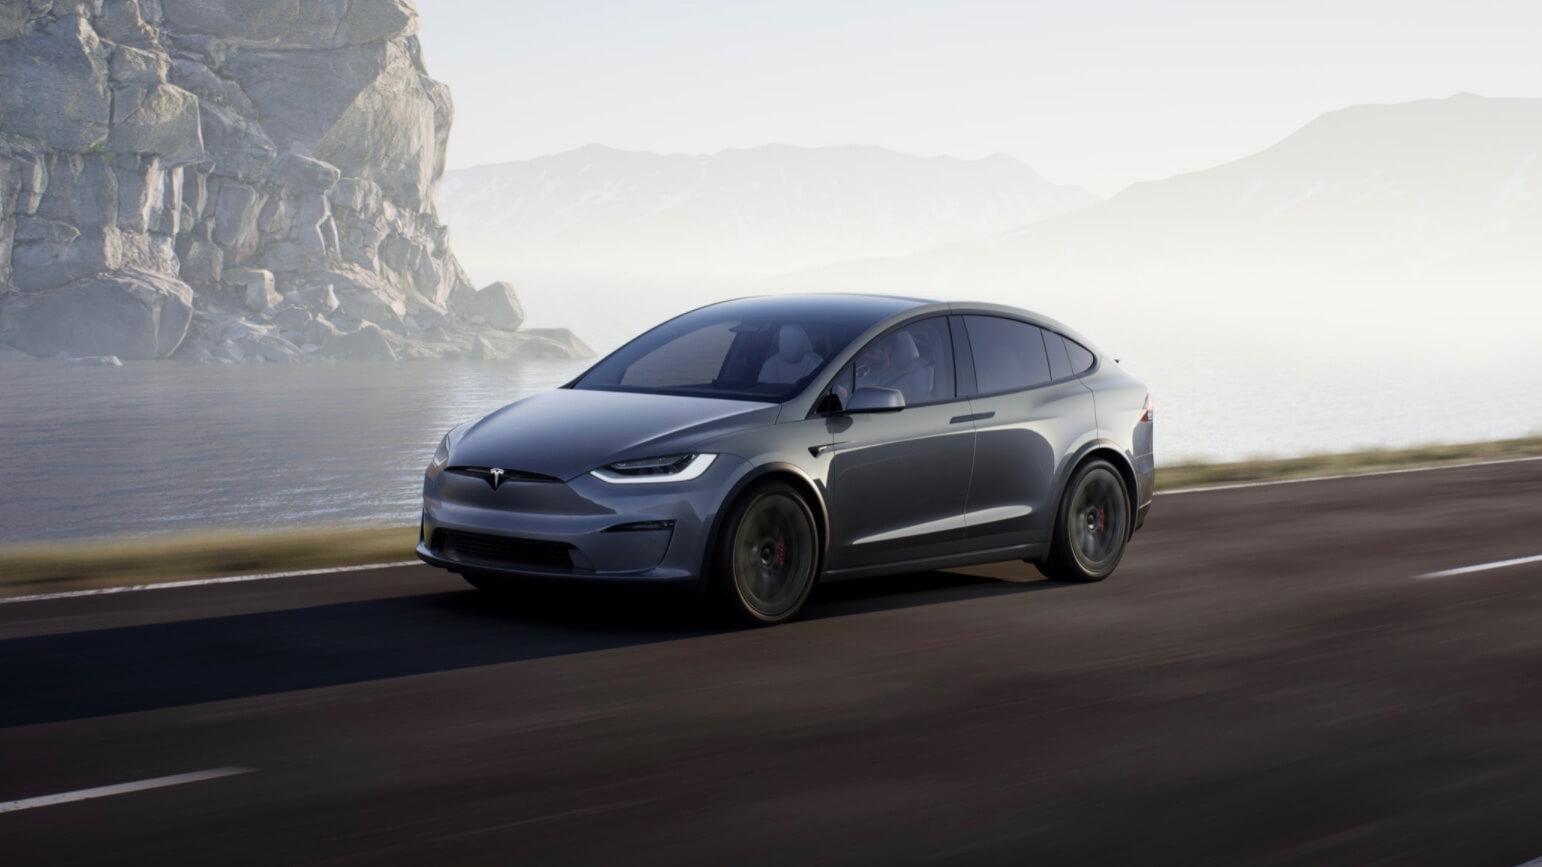 Tesla Model X SUV elétrico